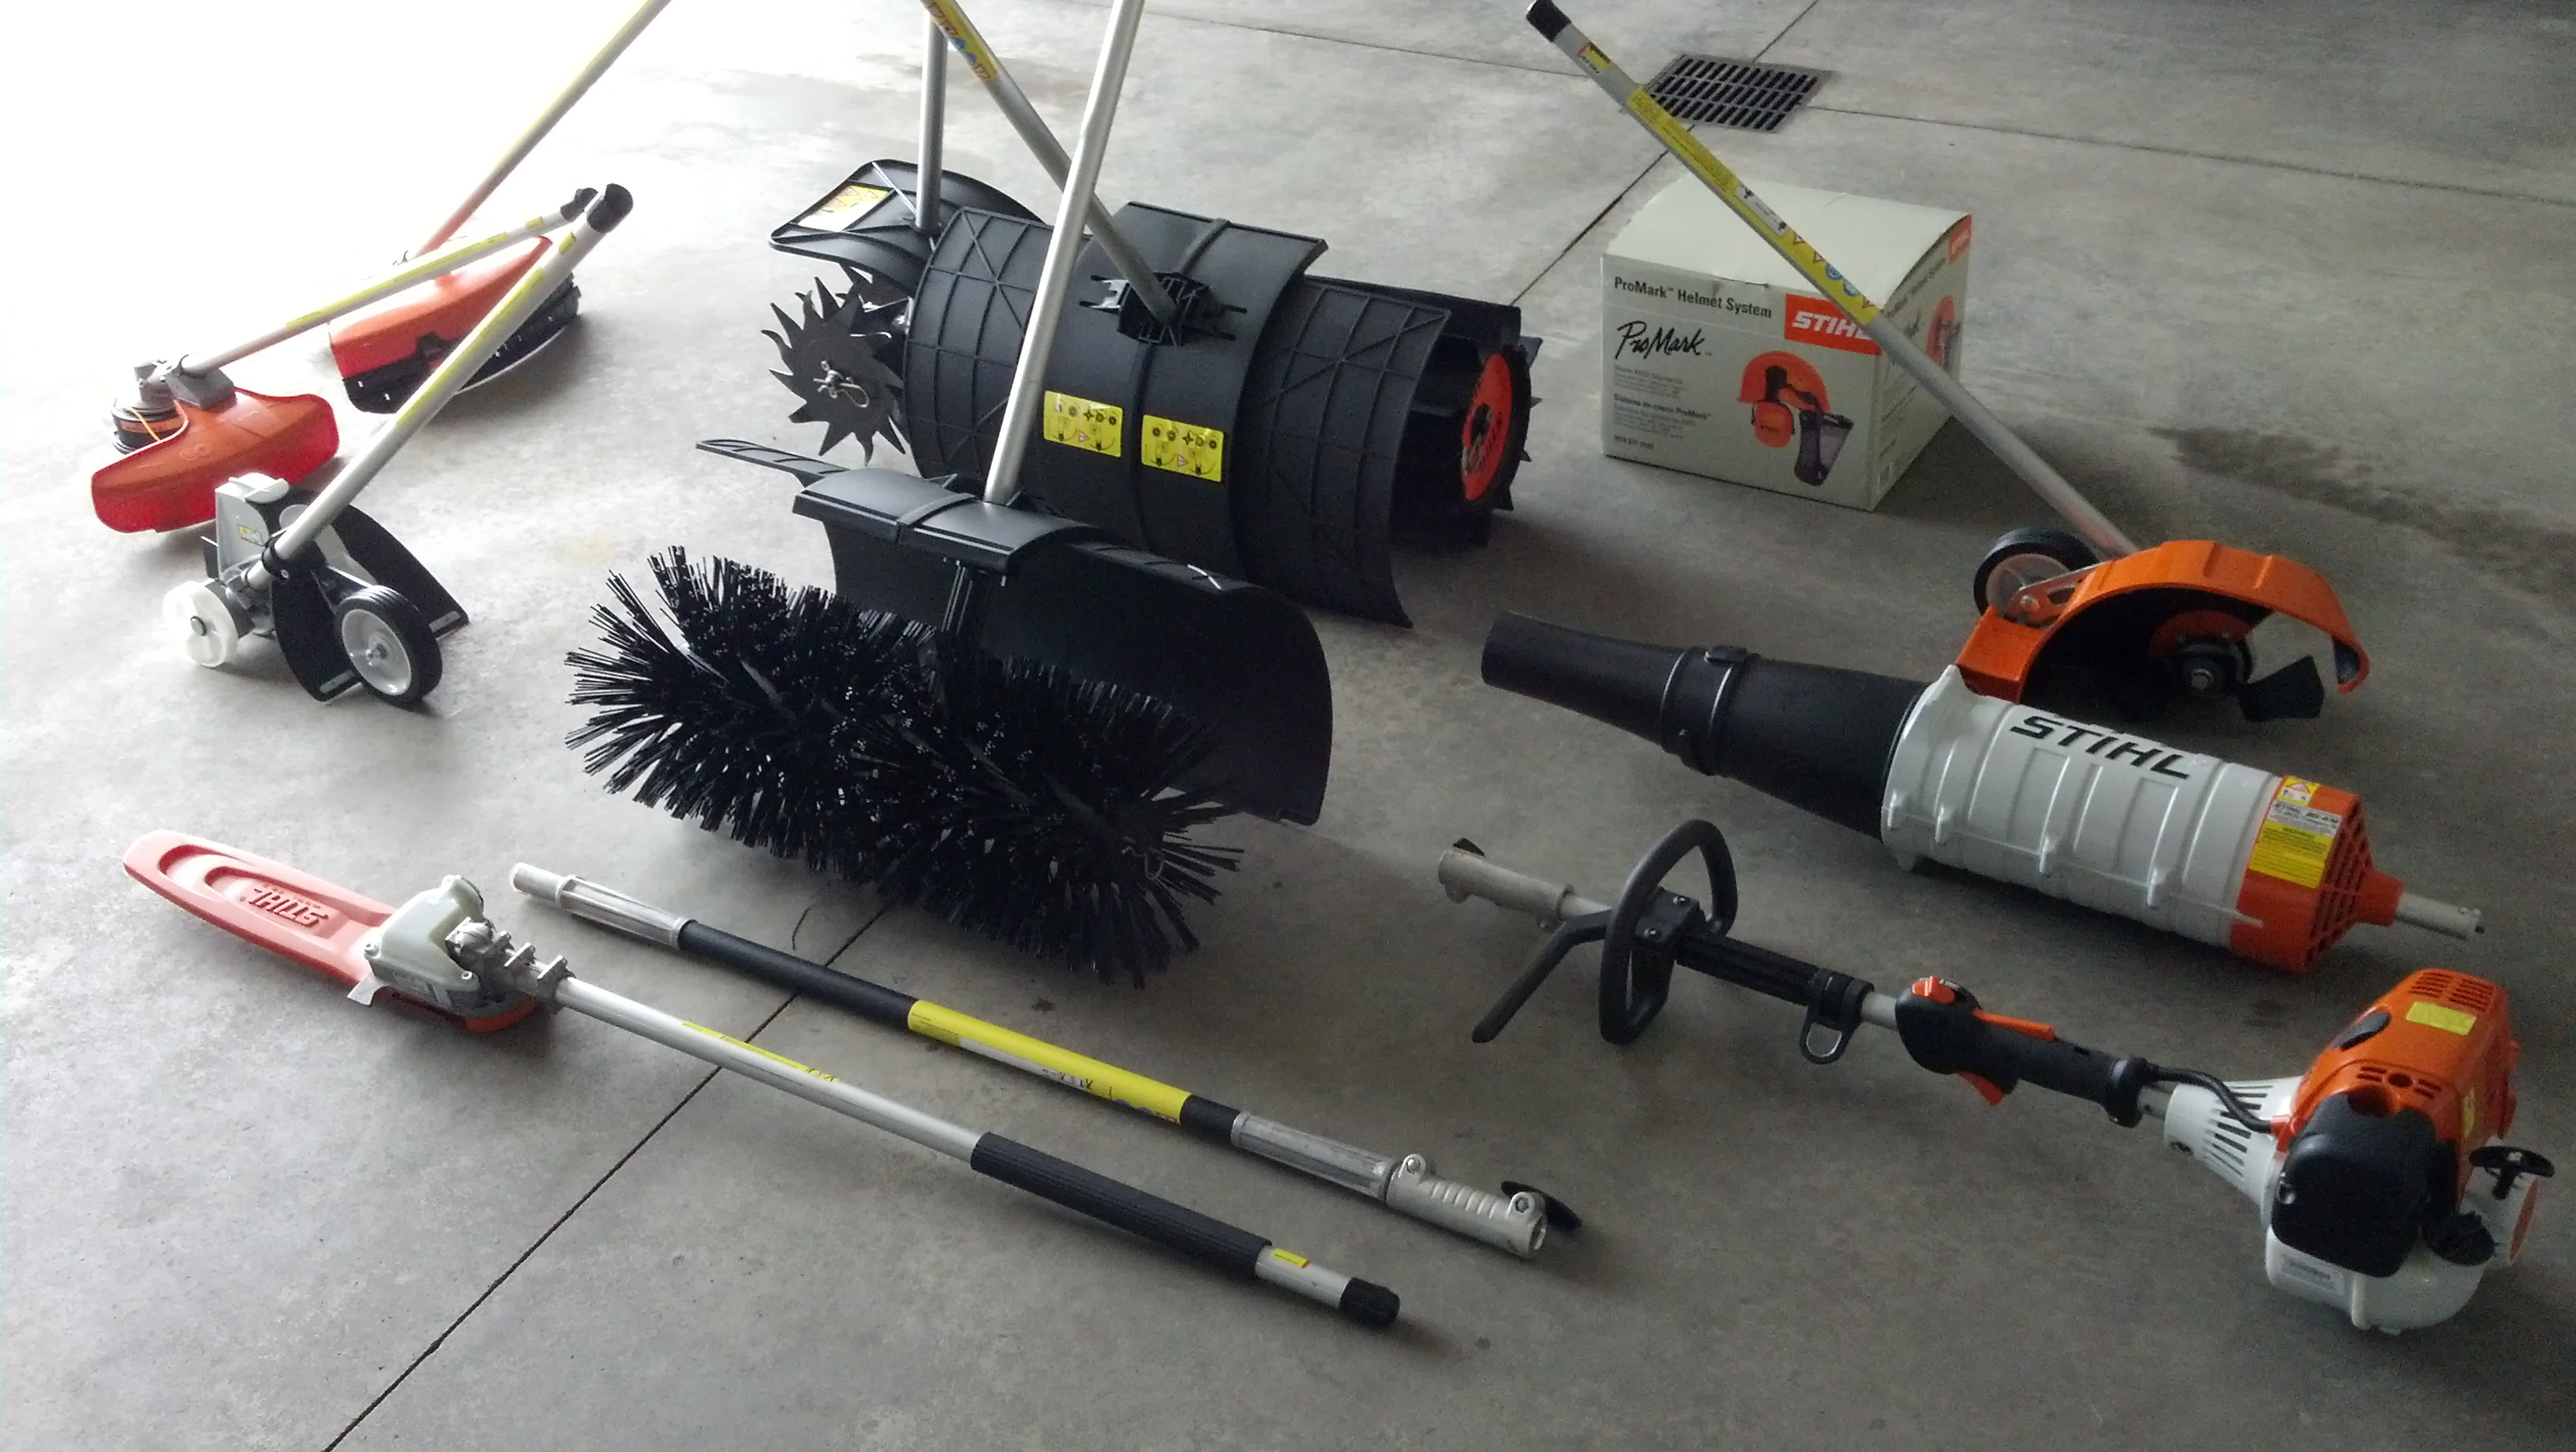 Stihl KM 130 R KombiSystem And Yard Boss Attachments